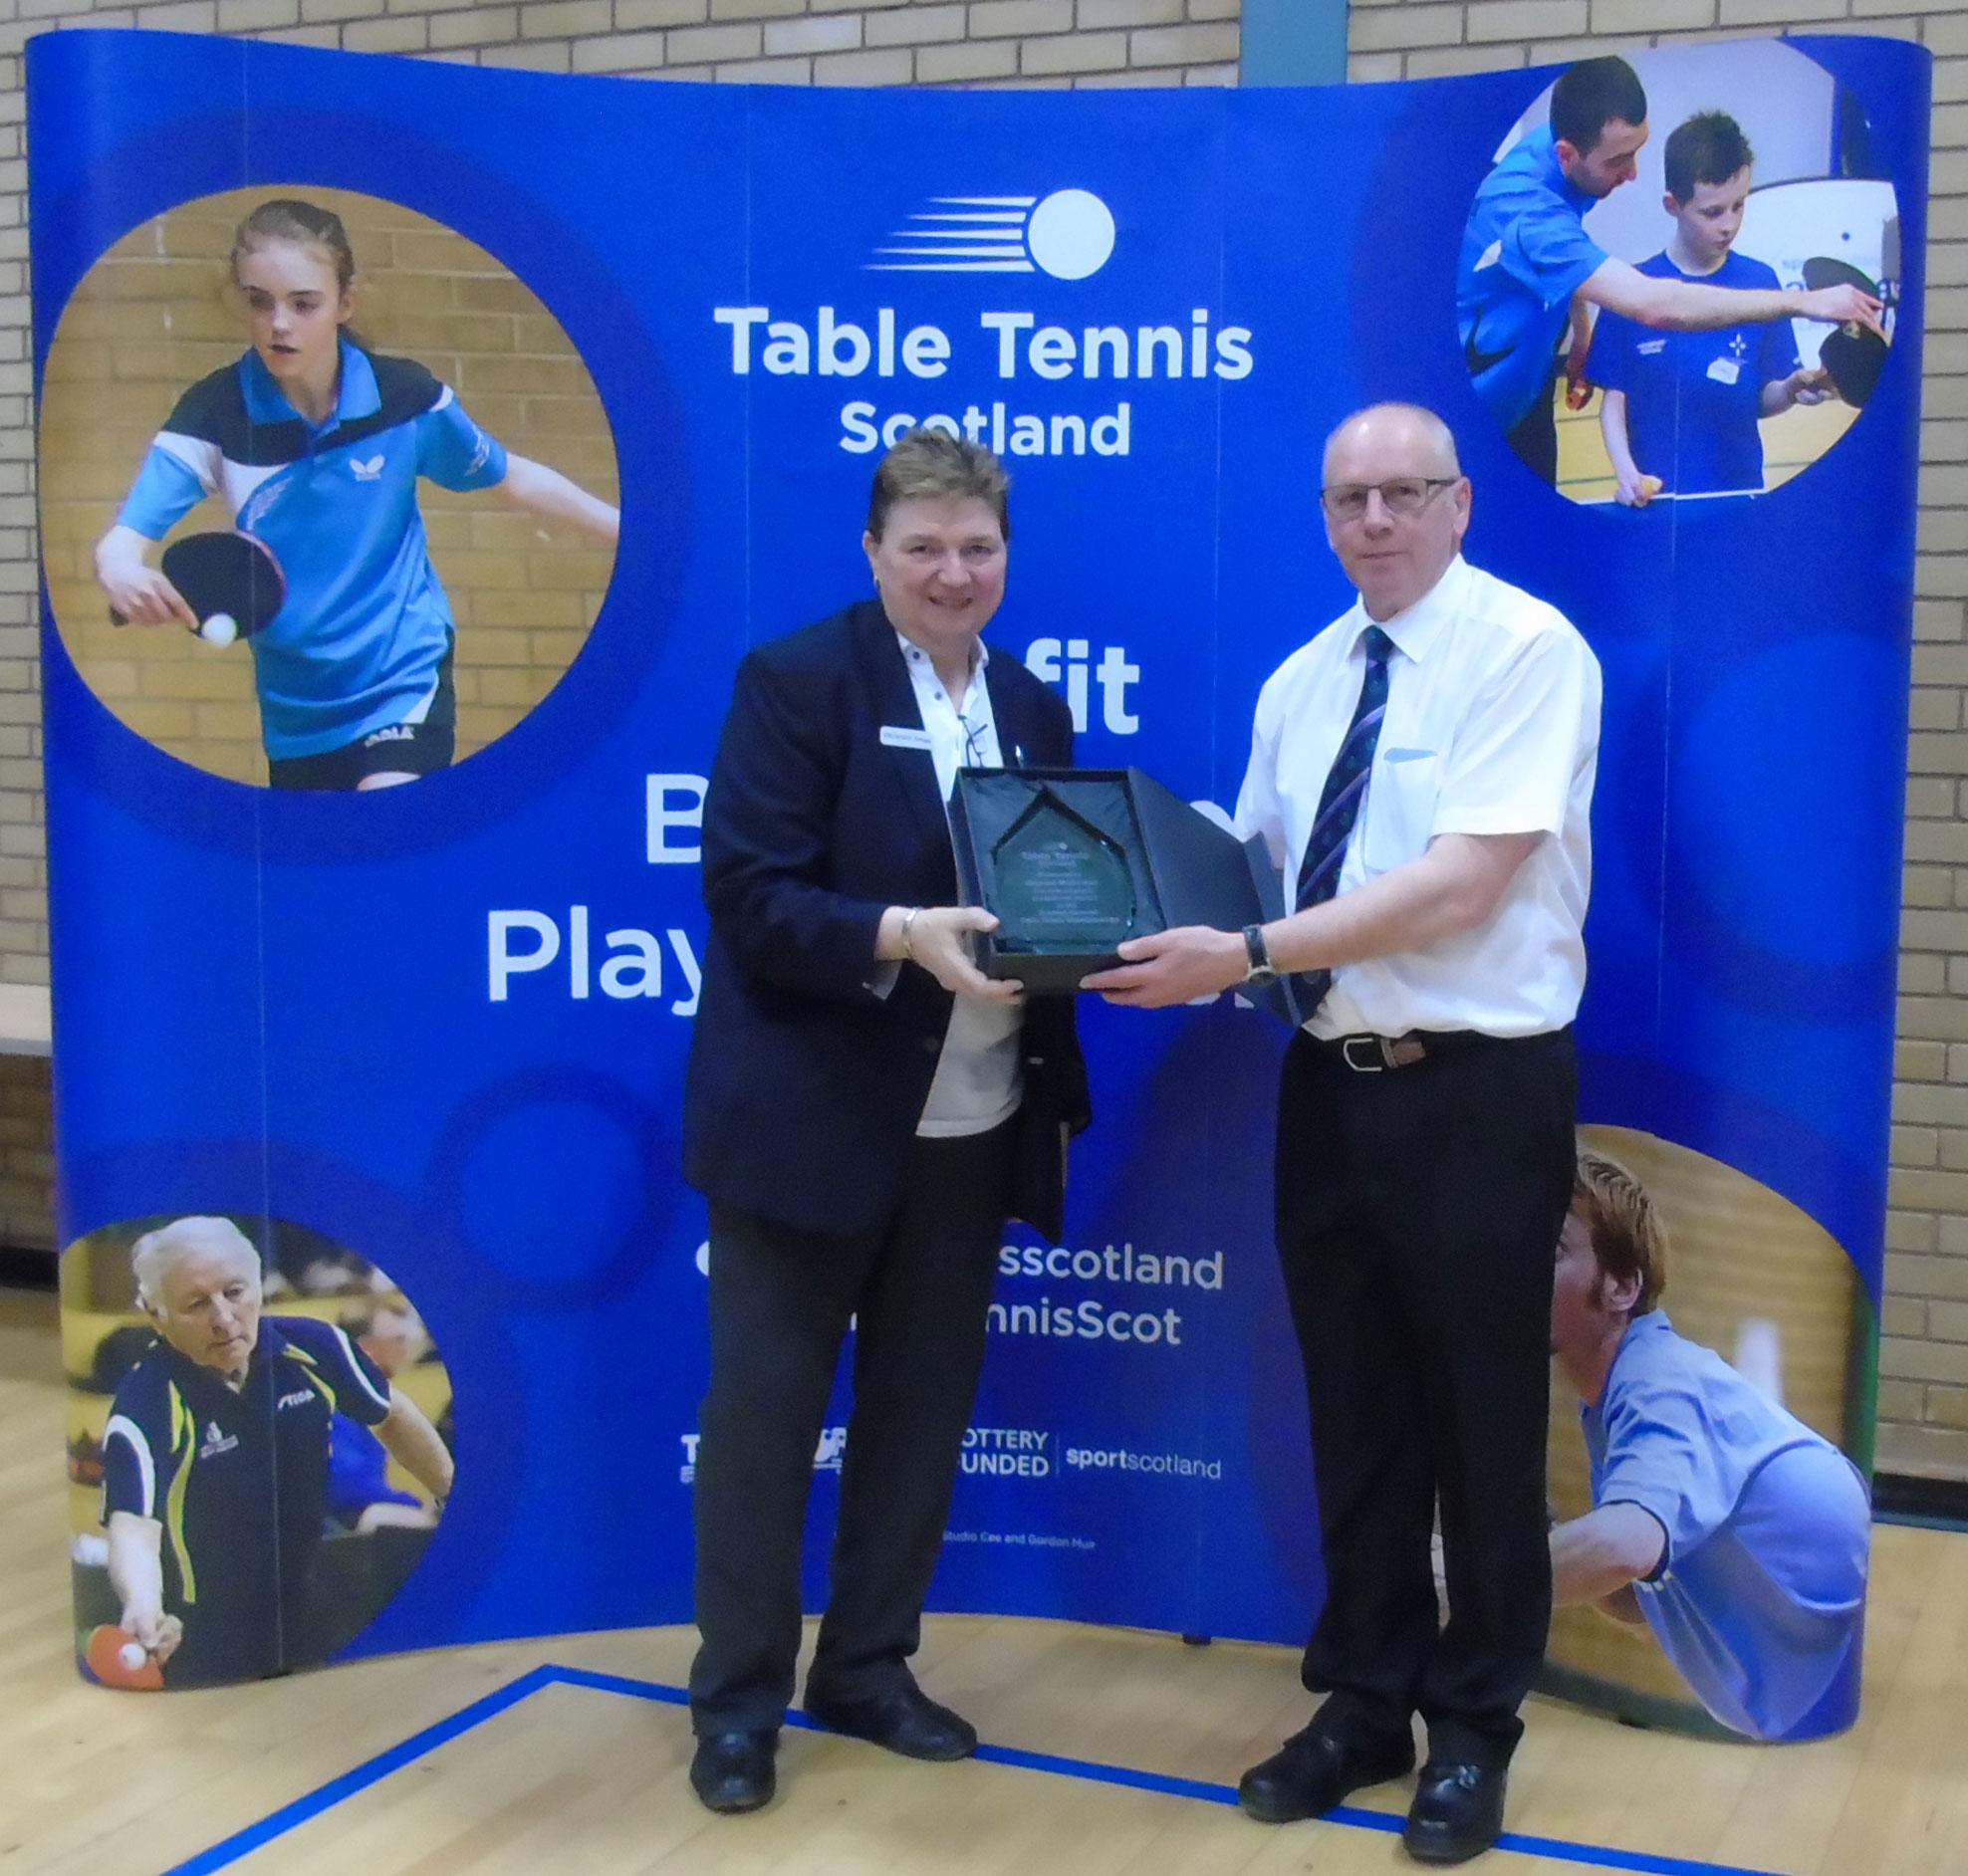 Exceptional Service Award: Stewart McGowan